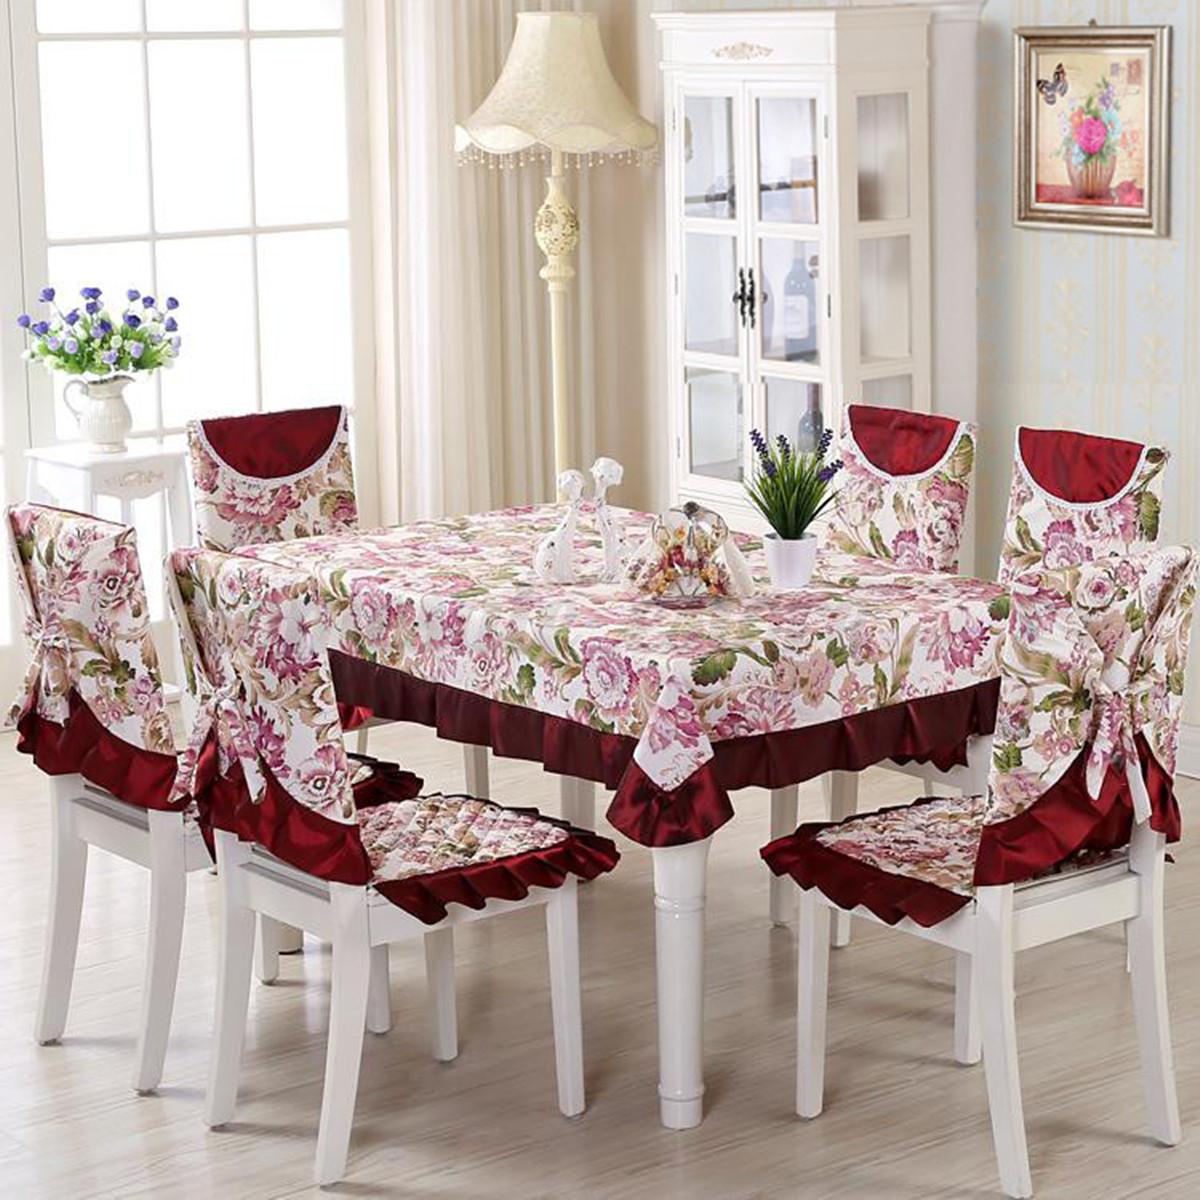 vintage floral tablecloths chair cover polyester banquet. Black Bedroom Furniture Sets. Home Design Ideas